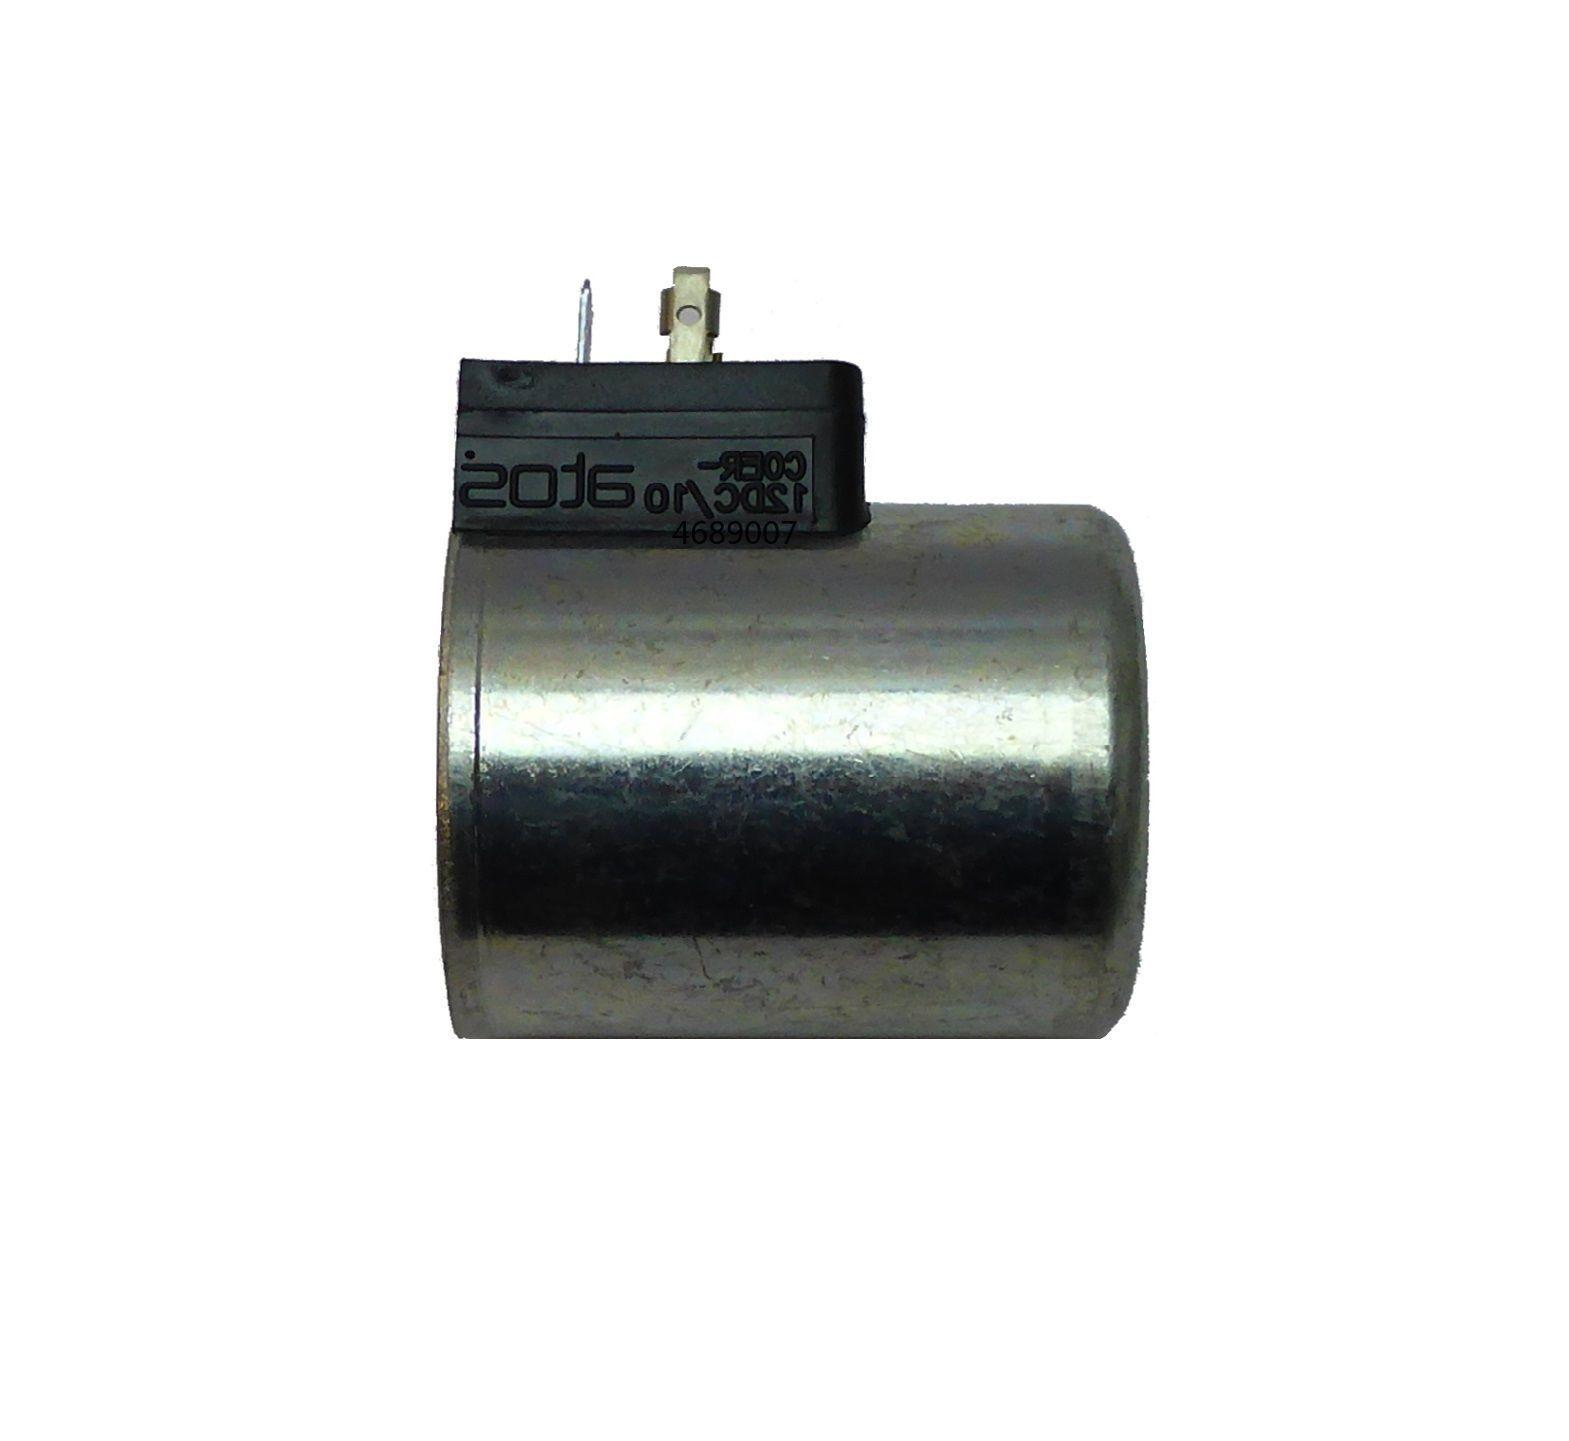 Atos SP-COER-12DC Magnet Spule Hydraulik Ventil solenoid coil valveAtos SP-COER-12DC Magnet Spule Hydraulik Ventil solenoid coil valve